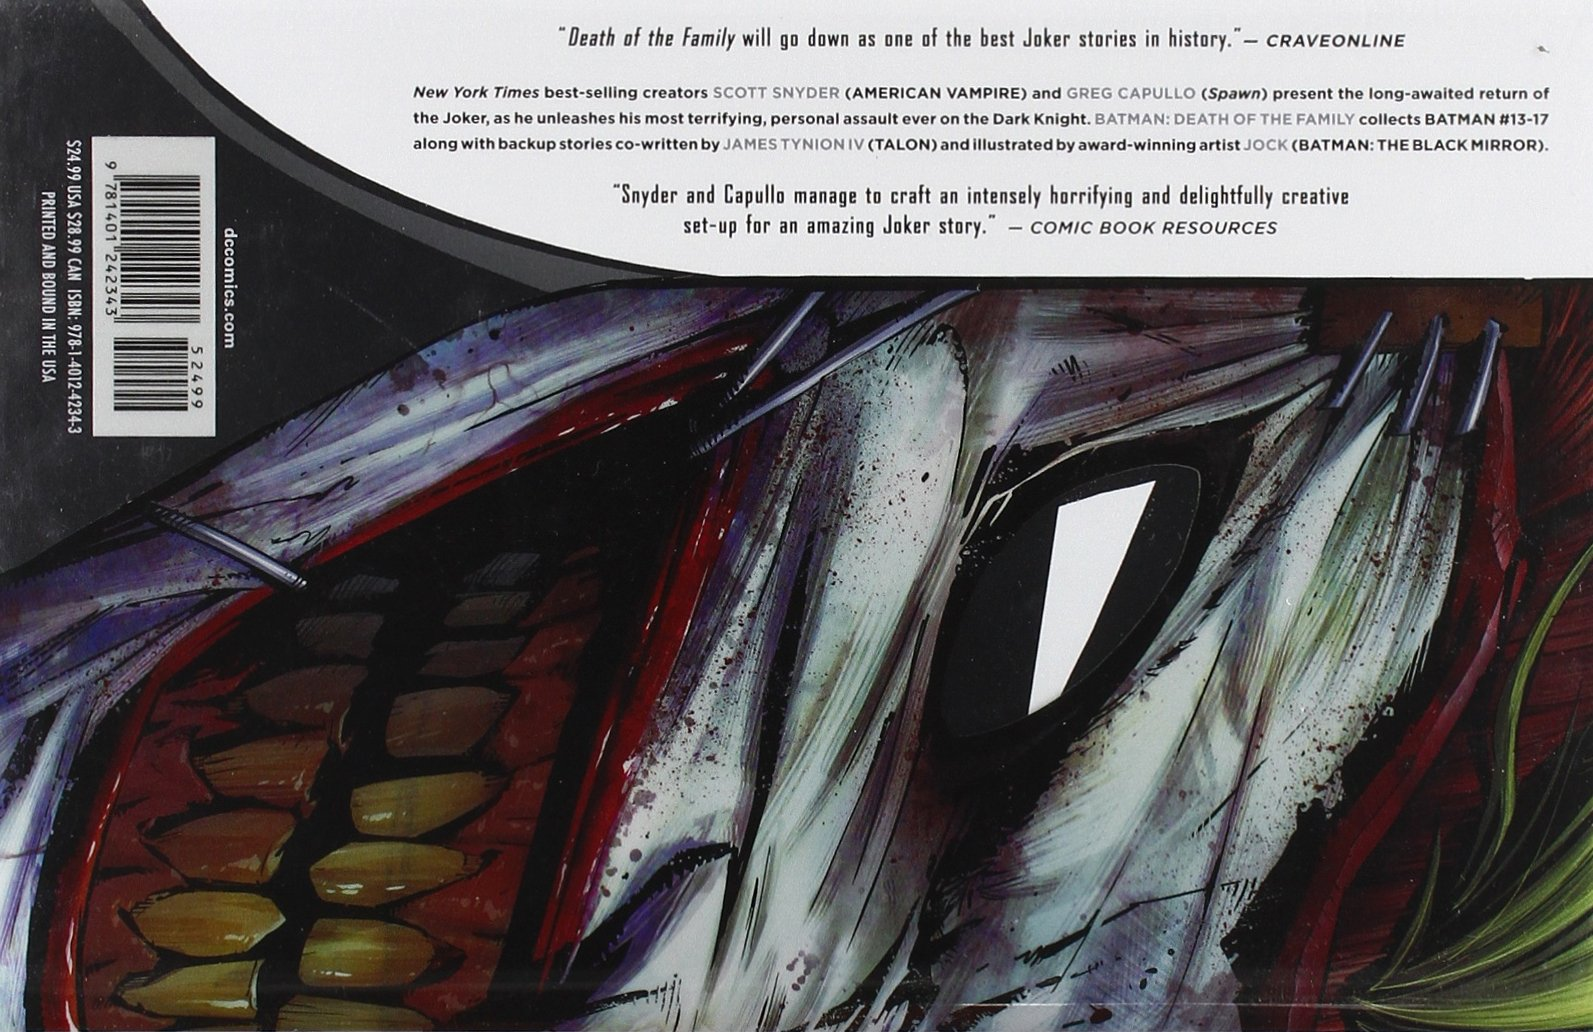 Batman Volume 3: Death of the Family HC (The New 52): Amazon.es: Scott Snyder: Libros en idiomas extranjeros